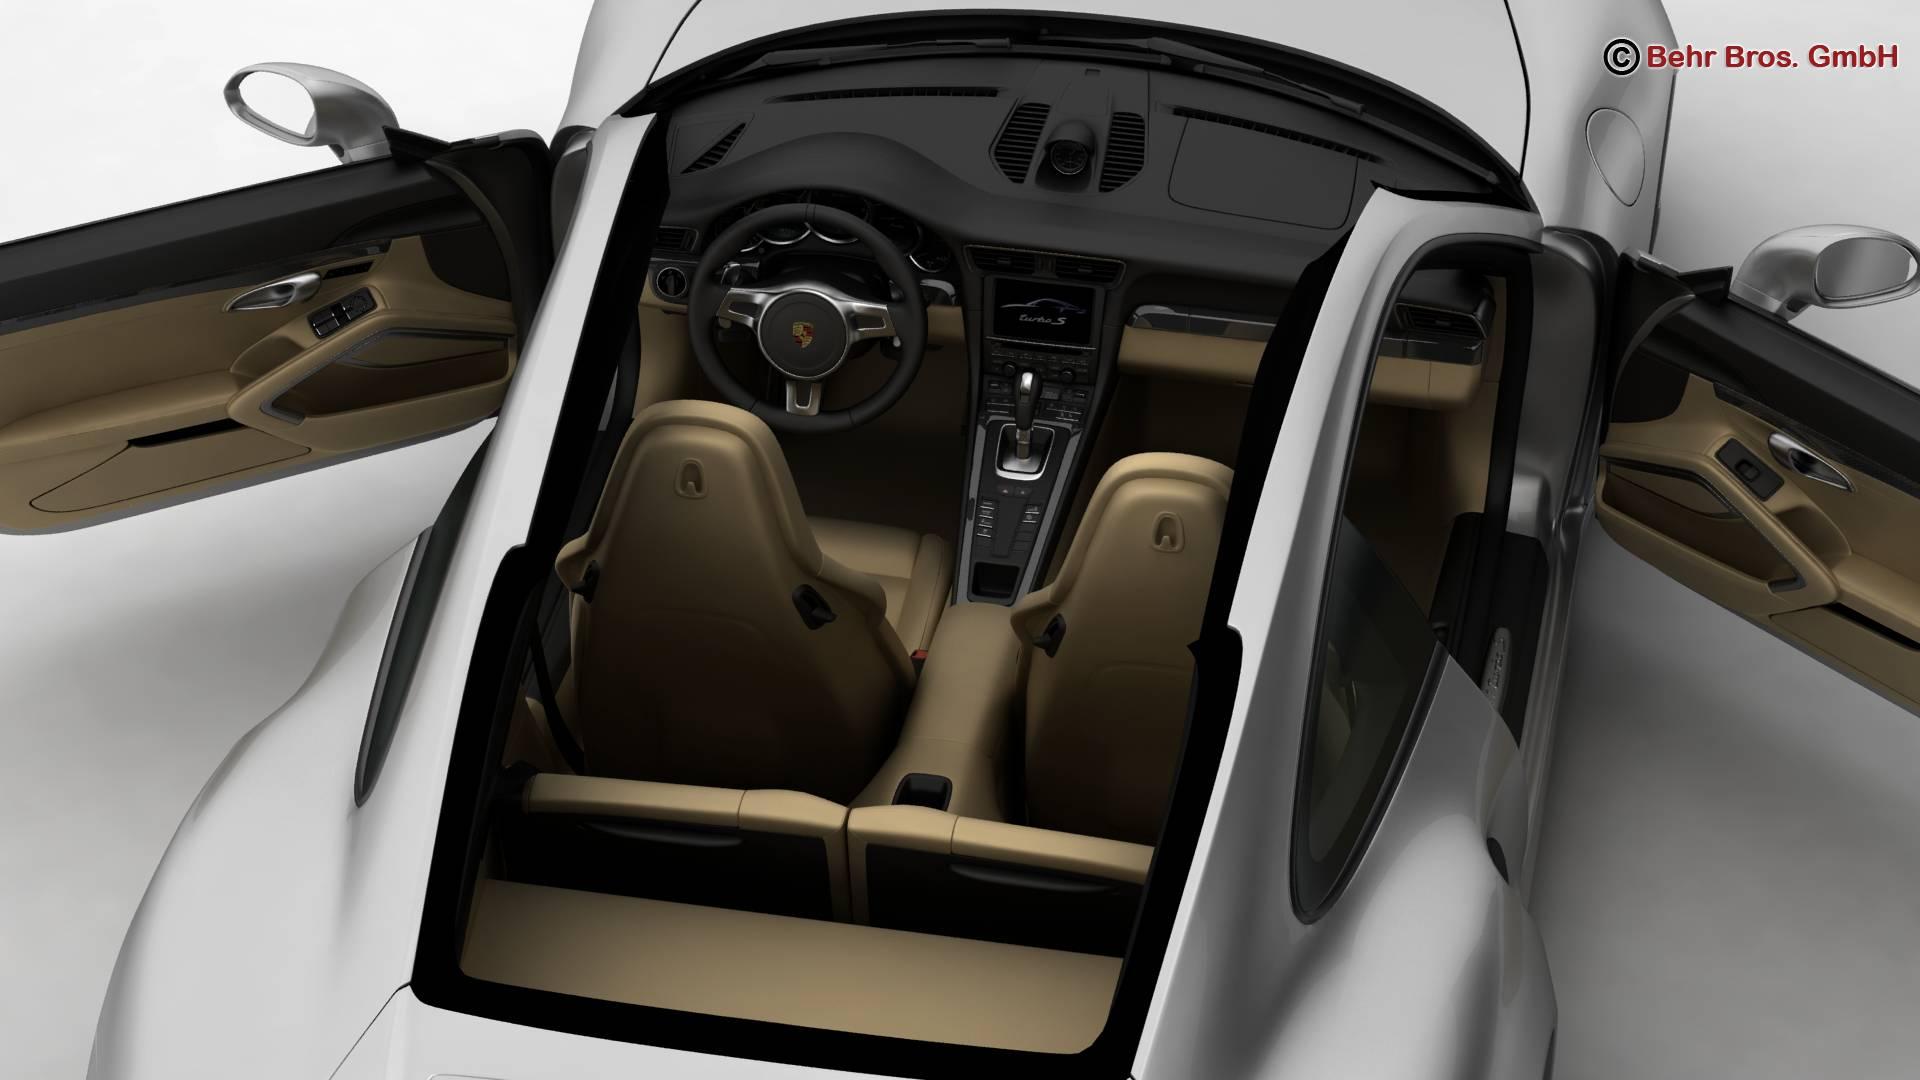 porsche 911 turbo s 2014 3d model 3ds max fbx c4d lwo ma mb obj 212487